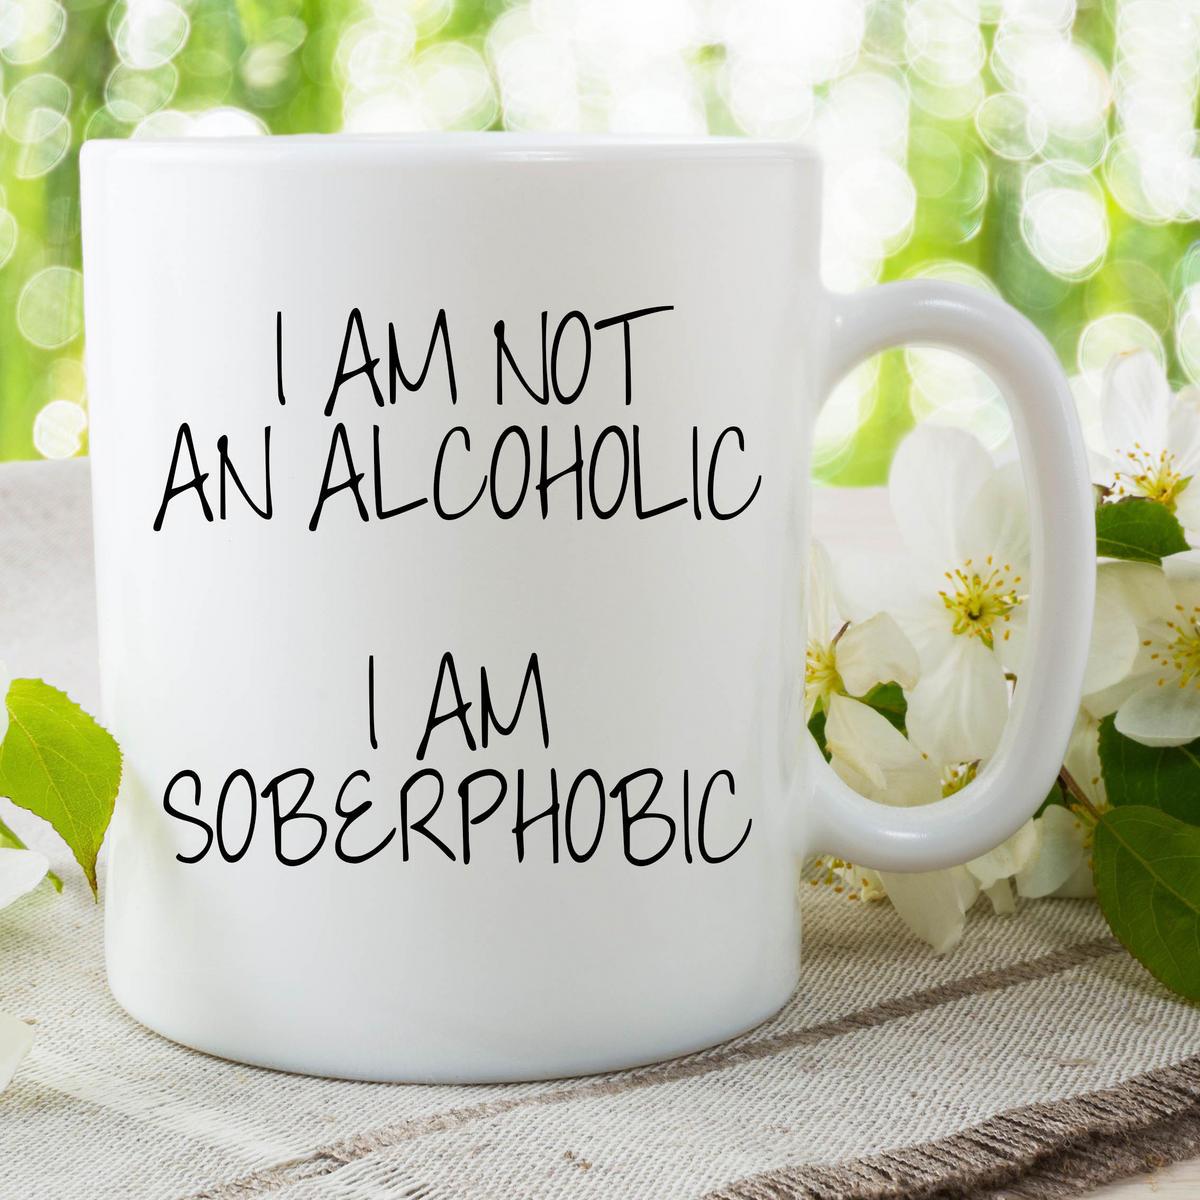 Funny Novelty Mugs I Am Not An Alcoholic I Am Soberphobic Friend Gifts WSDMUG653